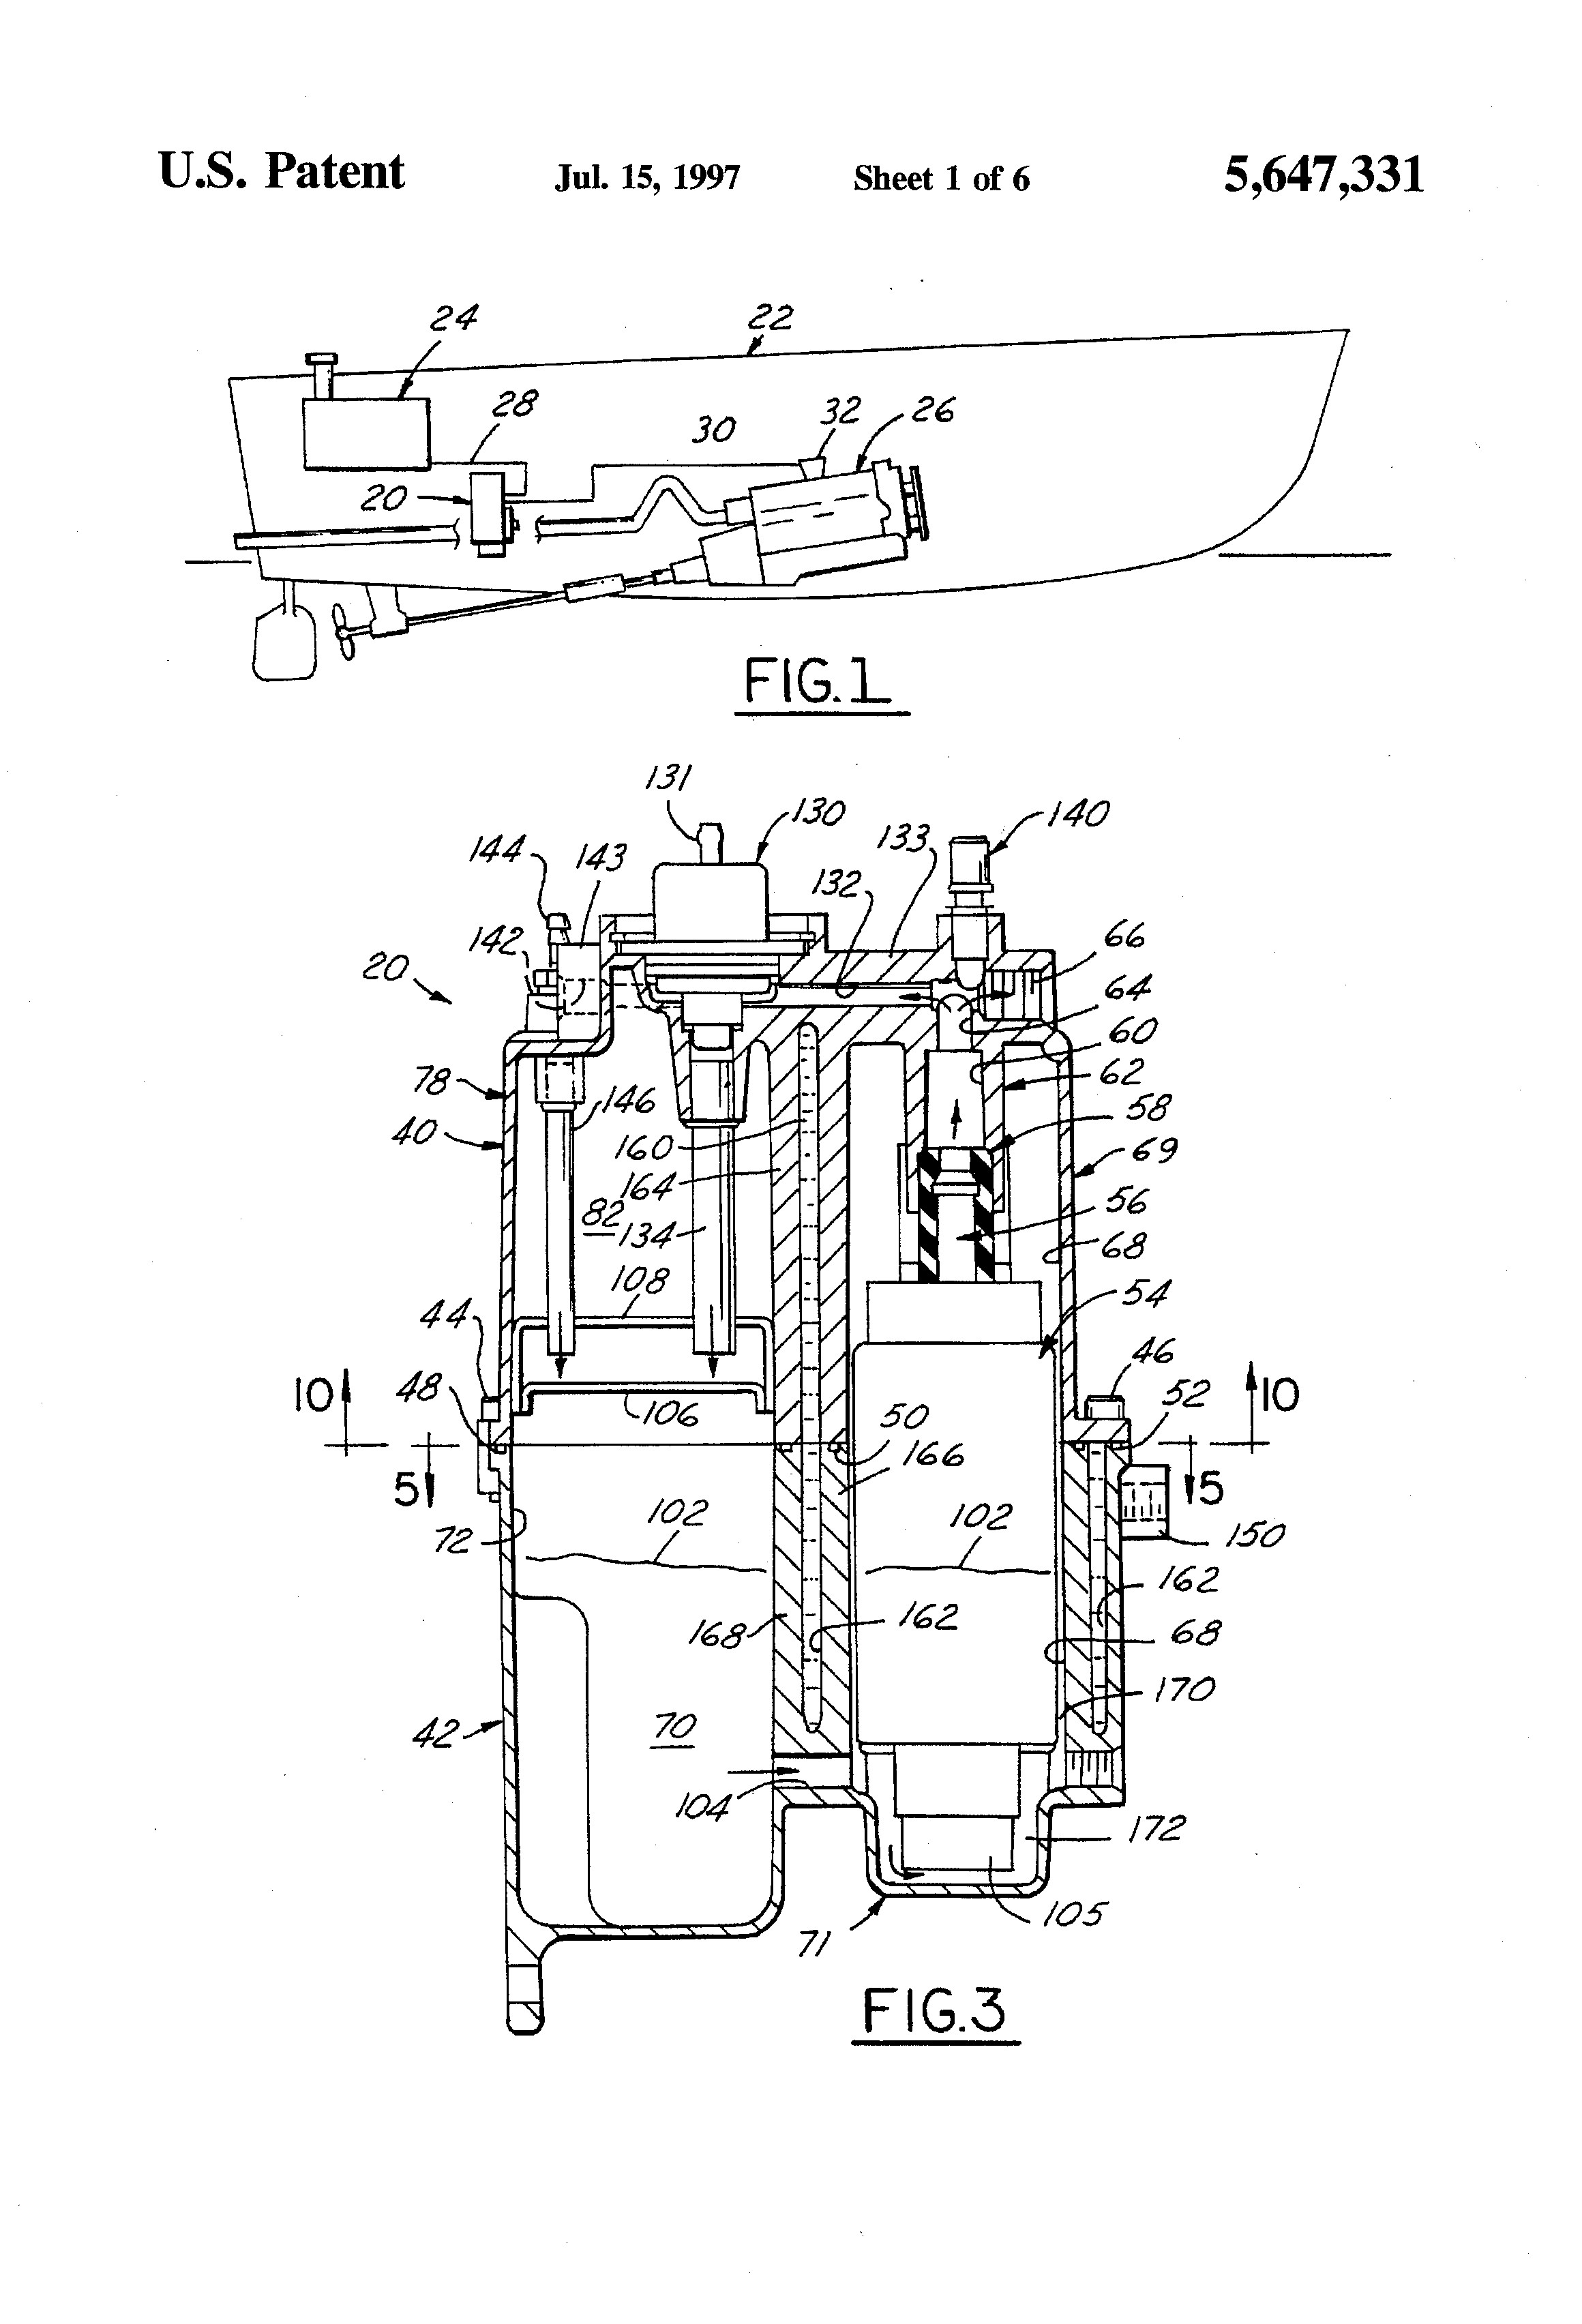 Marine Engine Cooling System Diagram Cooling System News Cooling System Vapor Lock Of Marine Engine Cooling System Diagram